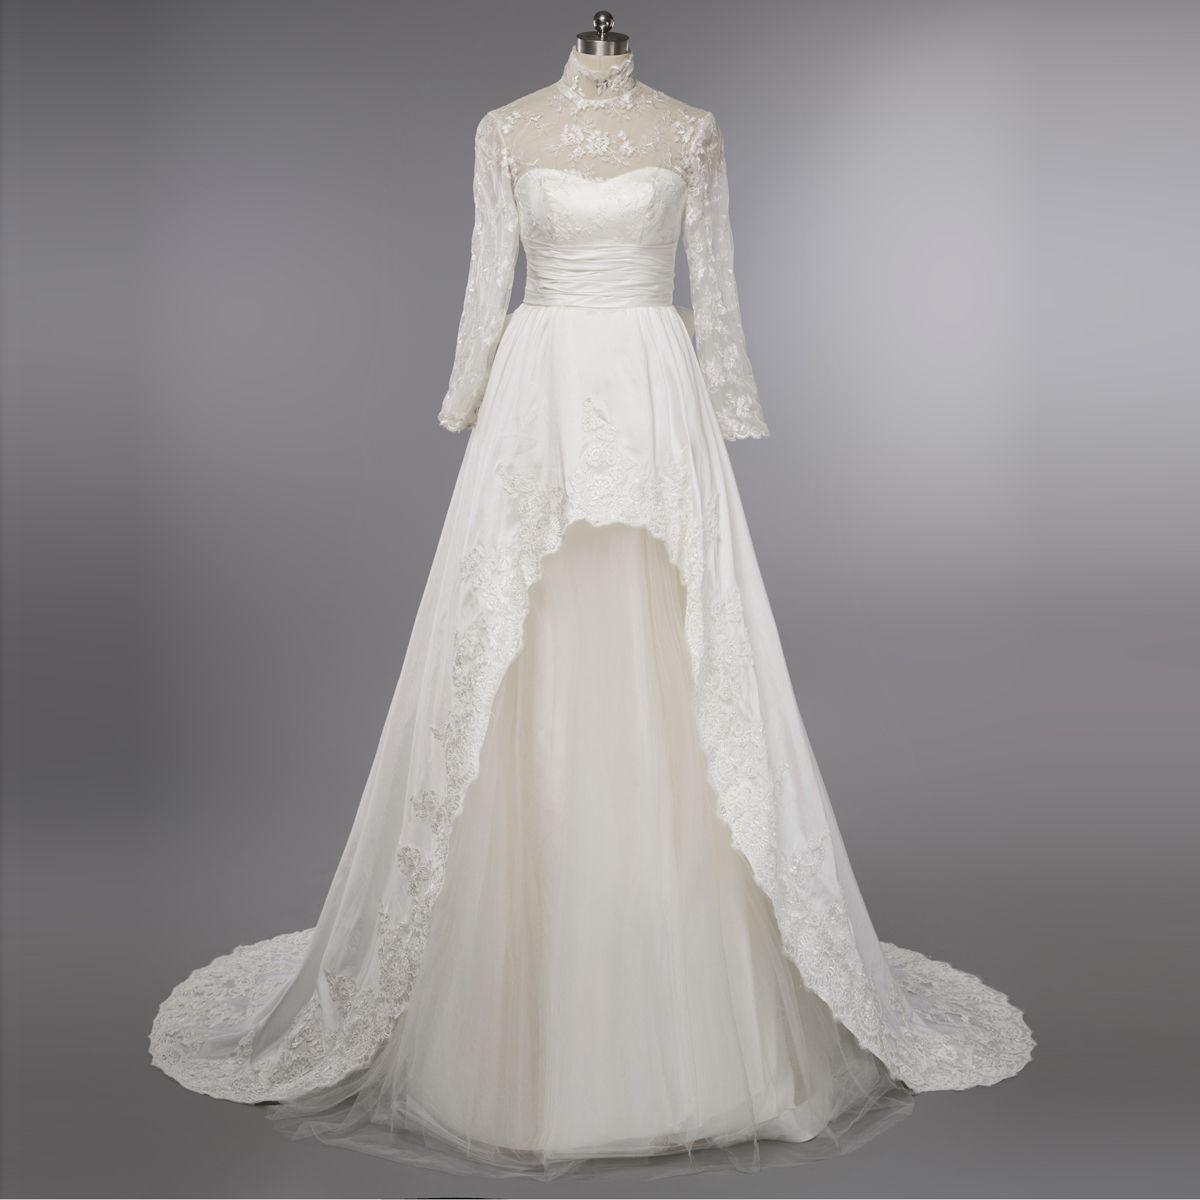 Wedding dresslong sleeves wedding dresshigh neck wedding dress